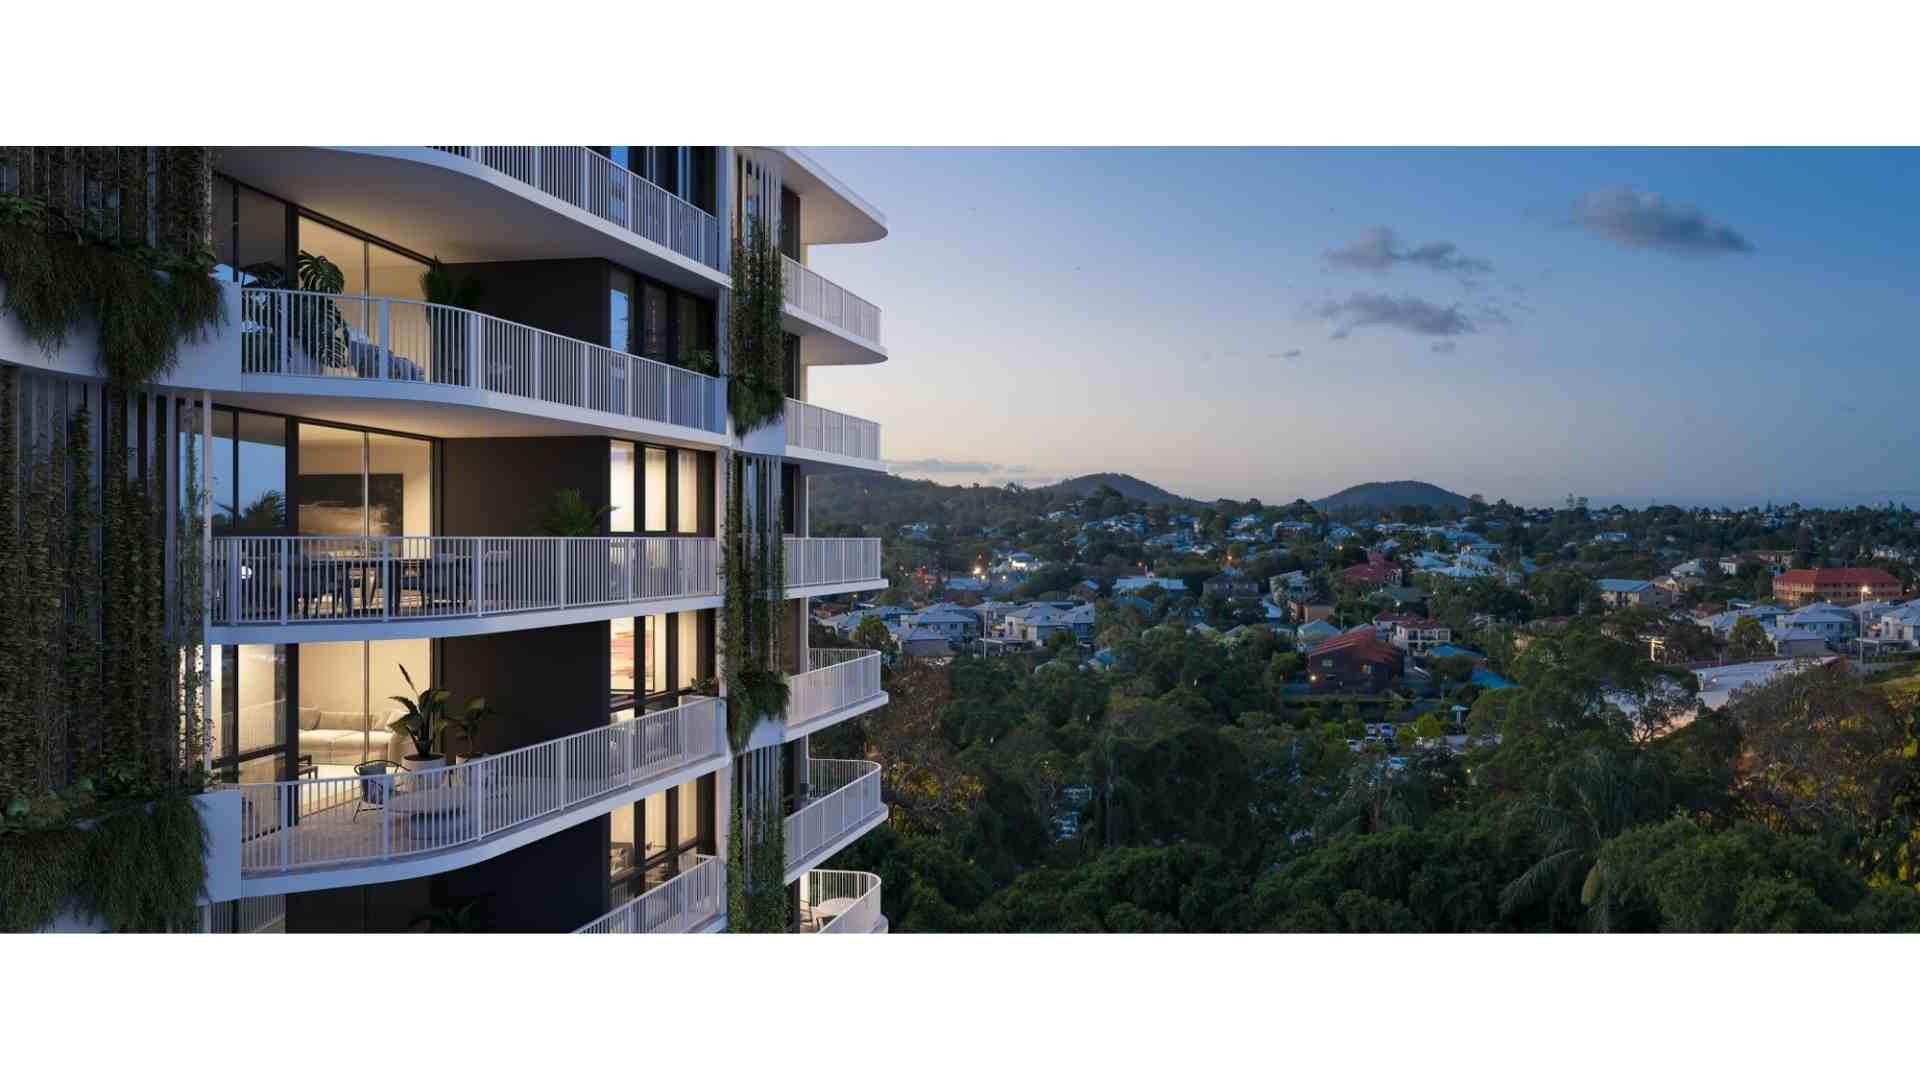 balcony overlooking inner city of brisbane